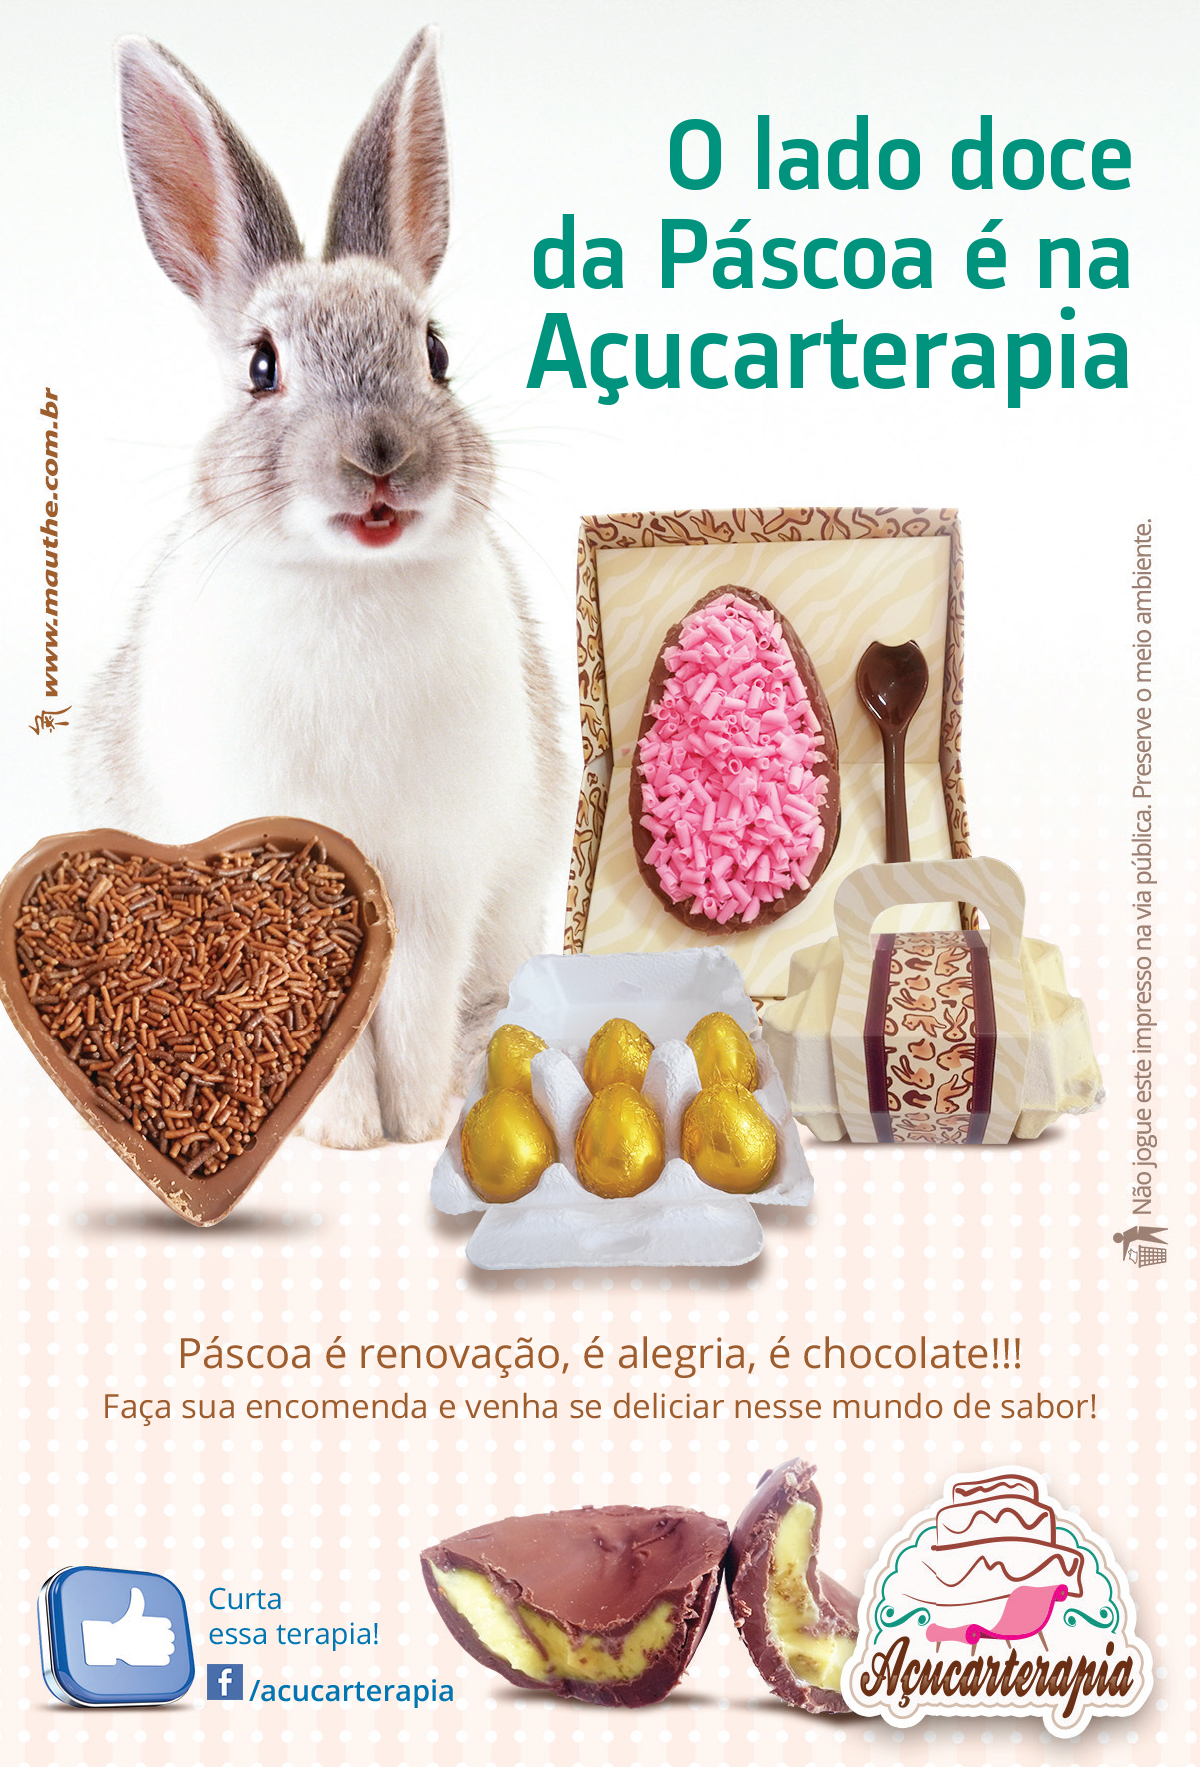 Folheto Páscoa Açucarterapia